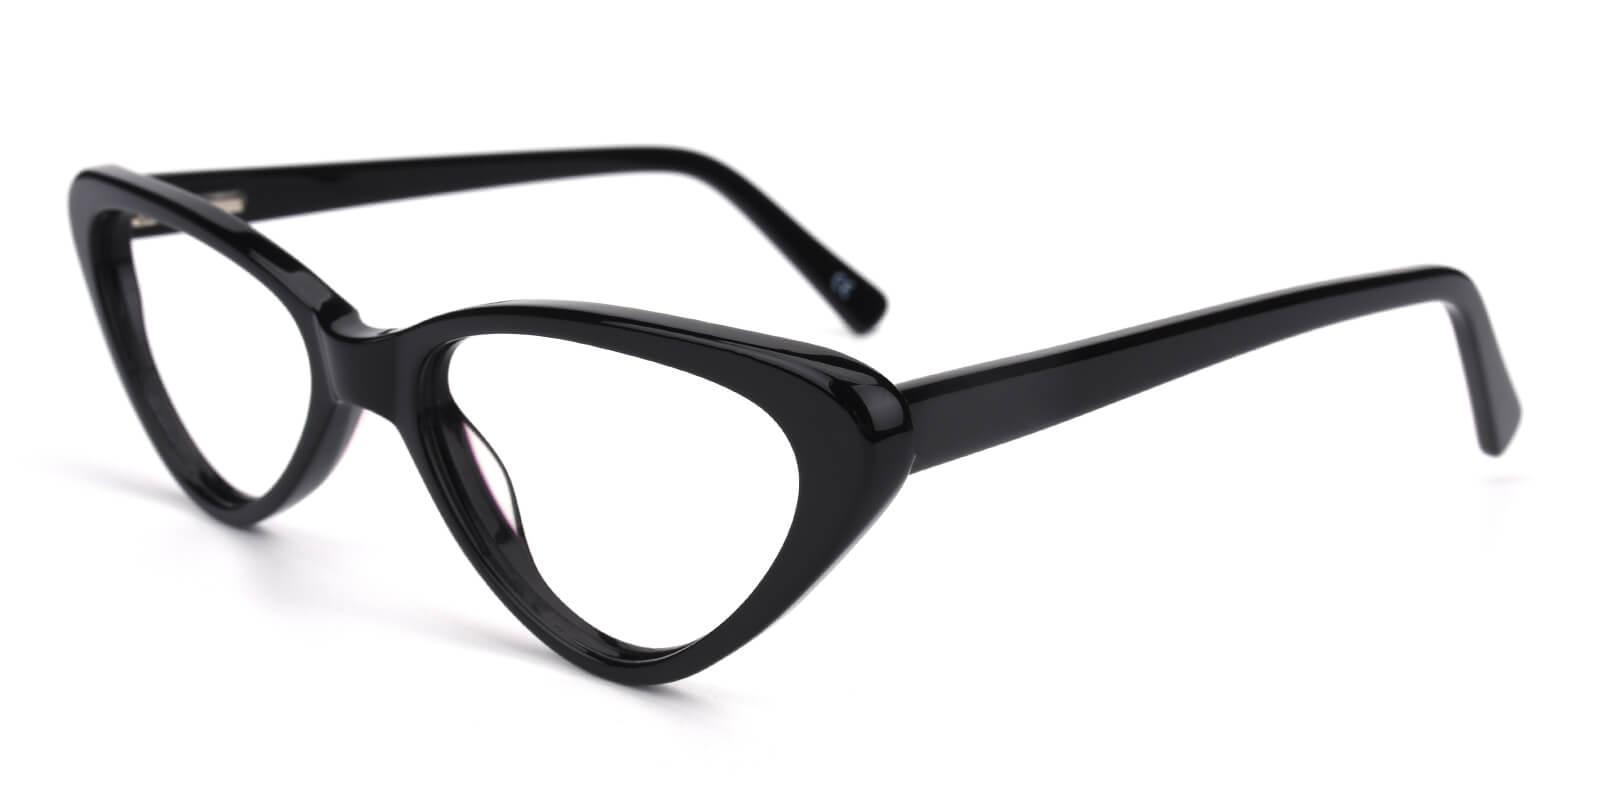 Catalin-Black-Cat-Acetate-Eyeglasses-additional1